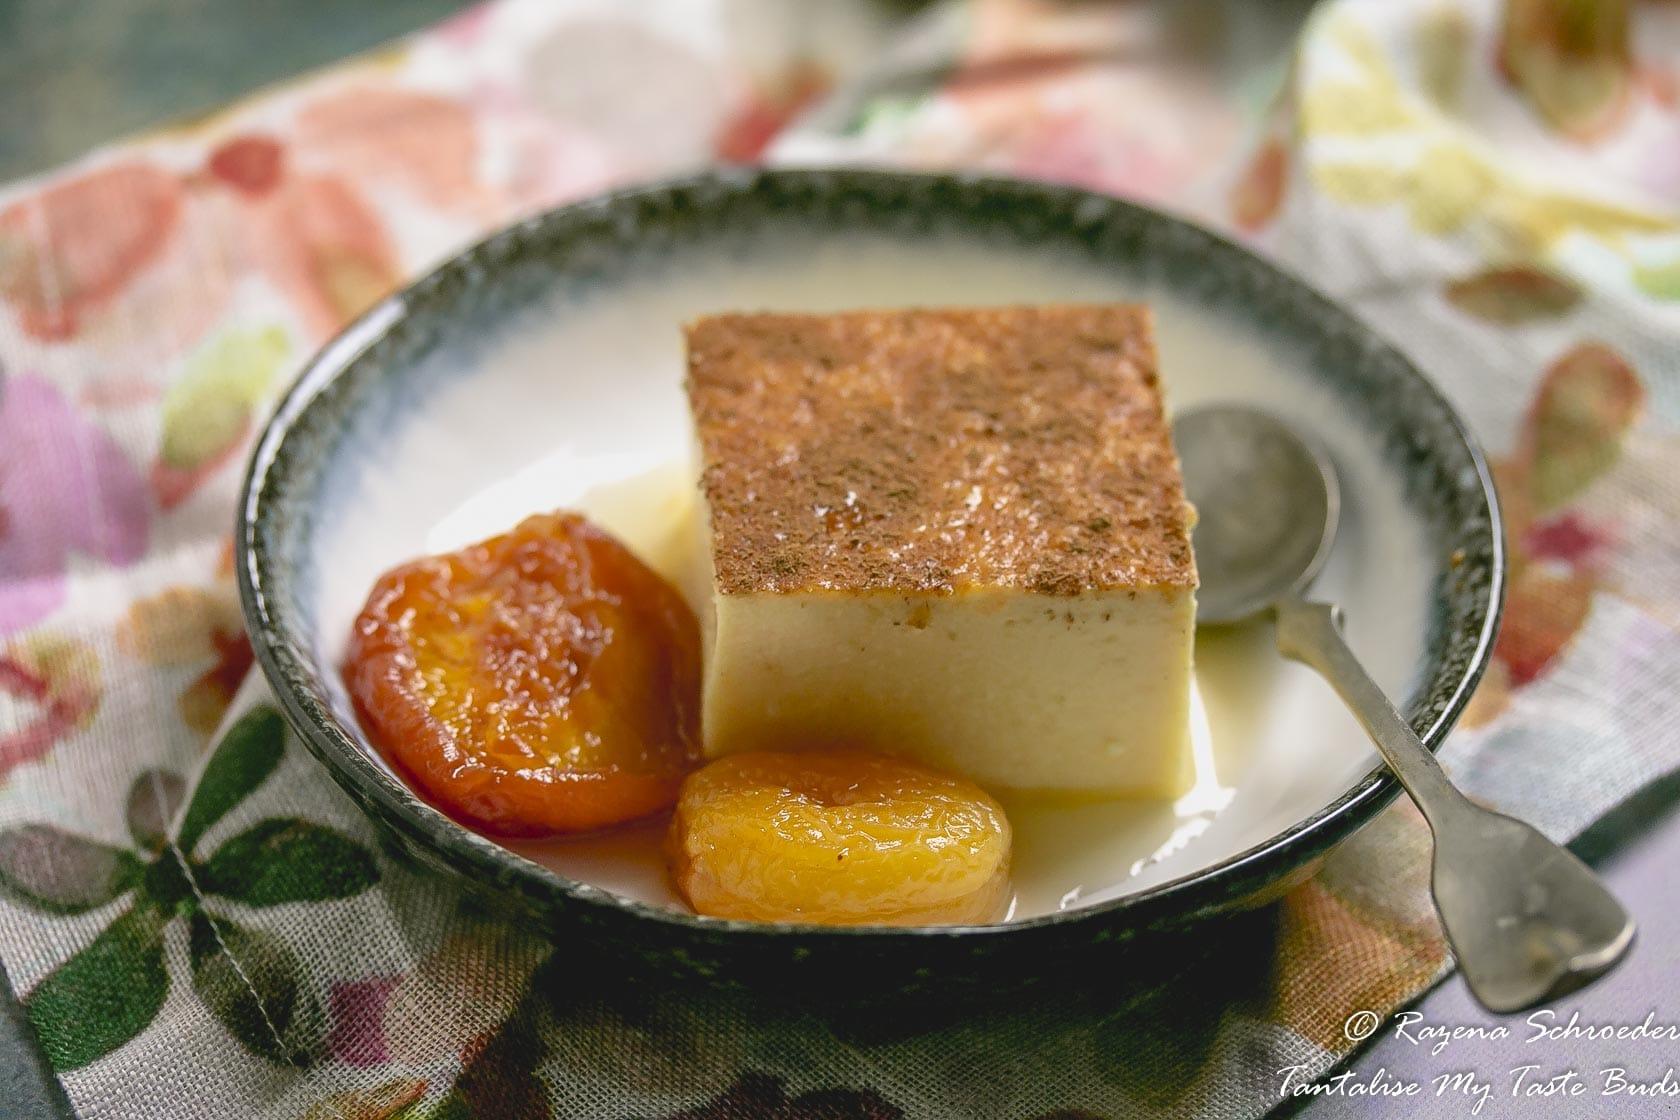 Aartappel poeding (Potato pudding)